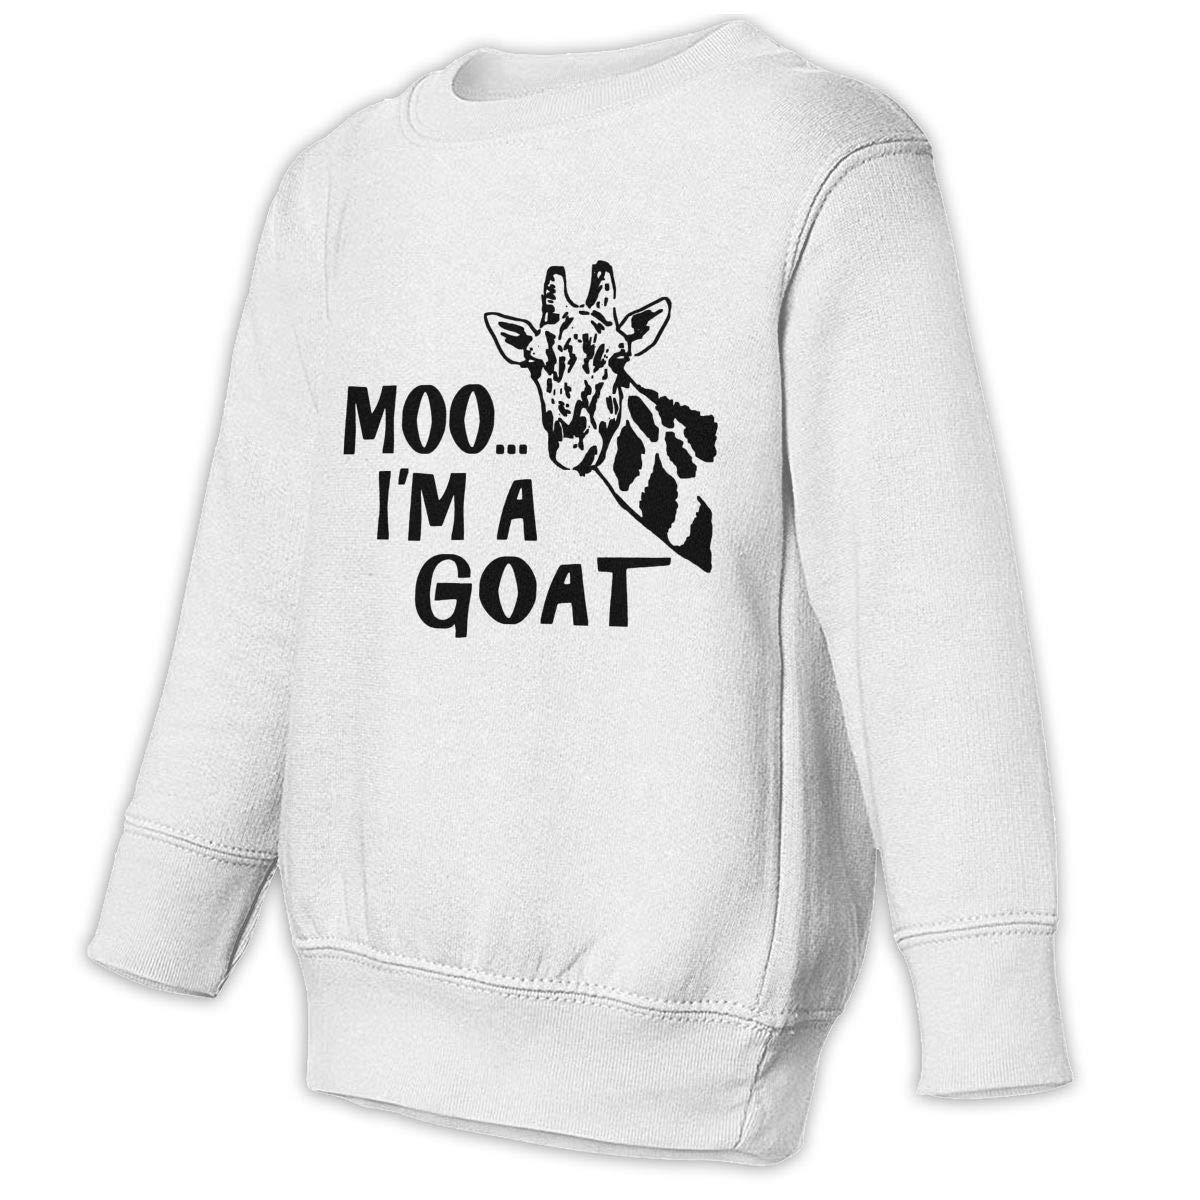 GHYNJUM Moo Im A Goat Funny Giraffe Toddler Unisex Cotton Long Sleeve Round Neck Sweatshirt